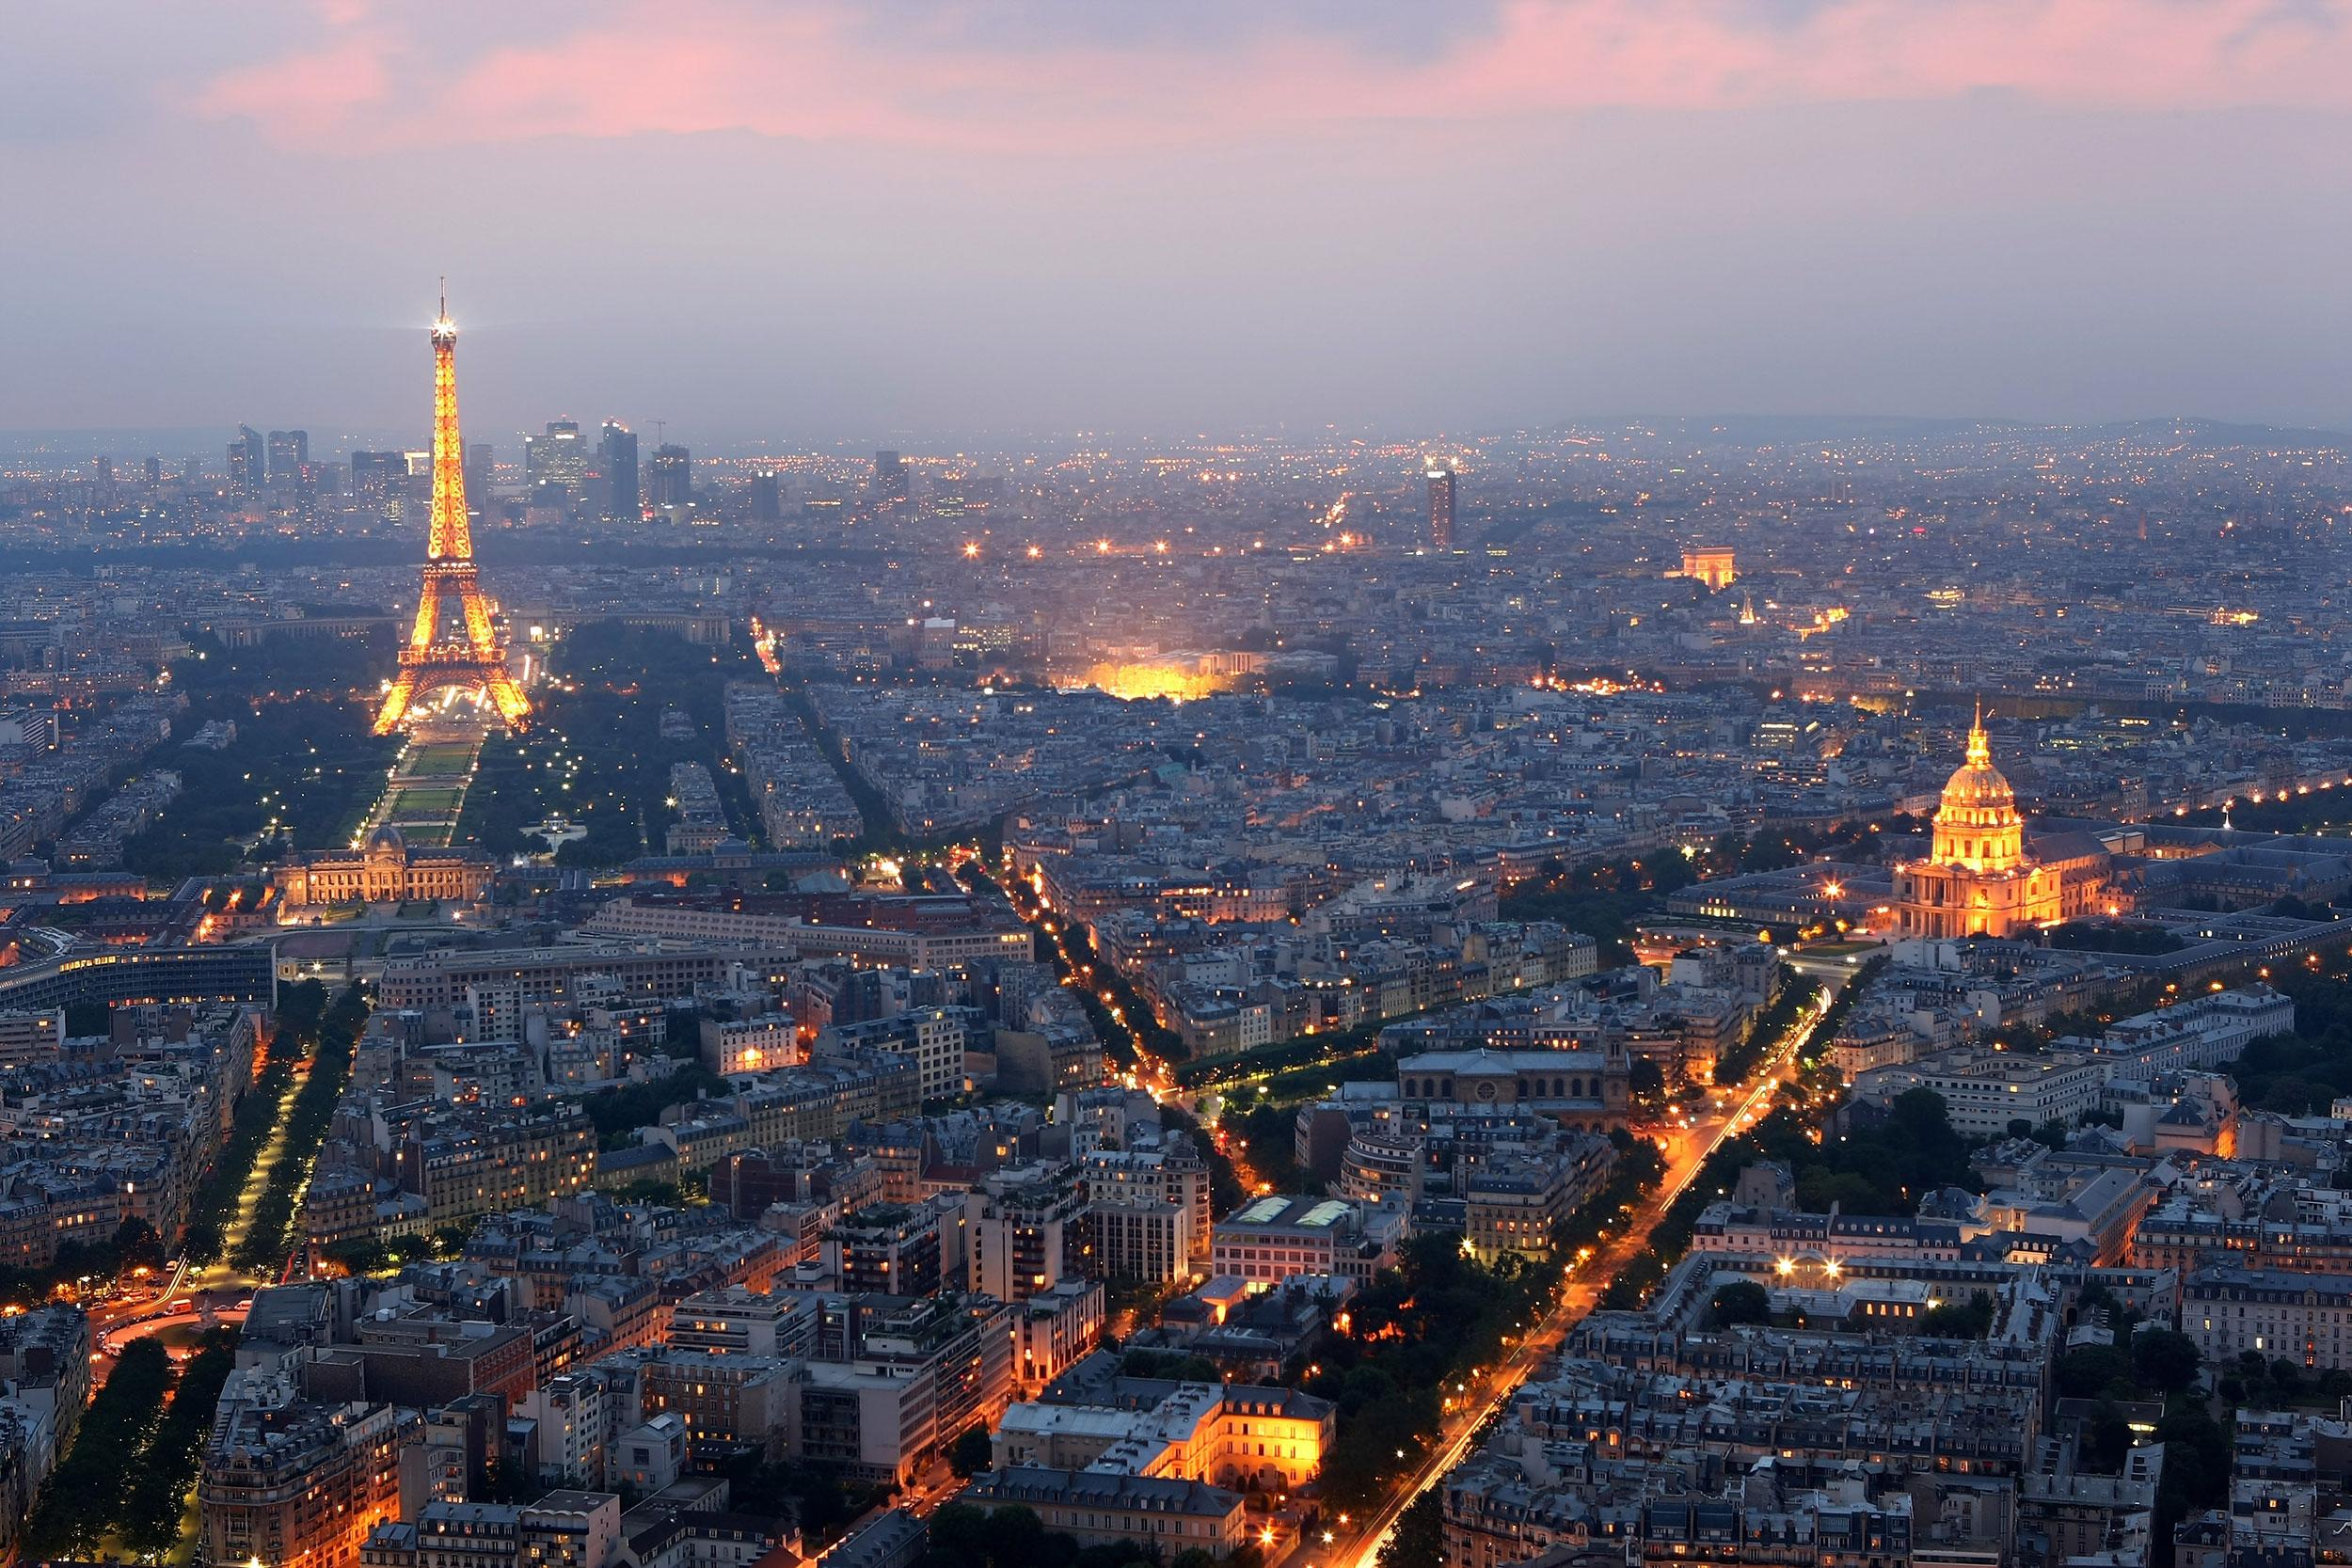 A general view of Paris, France.